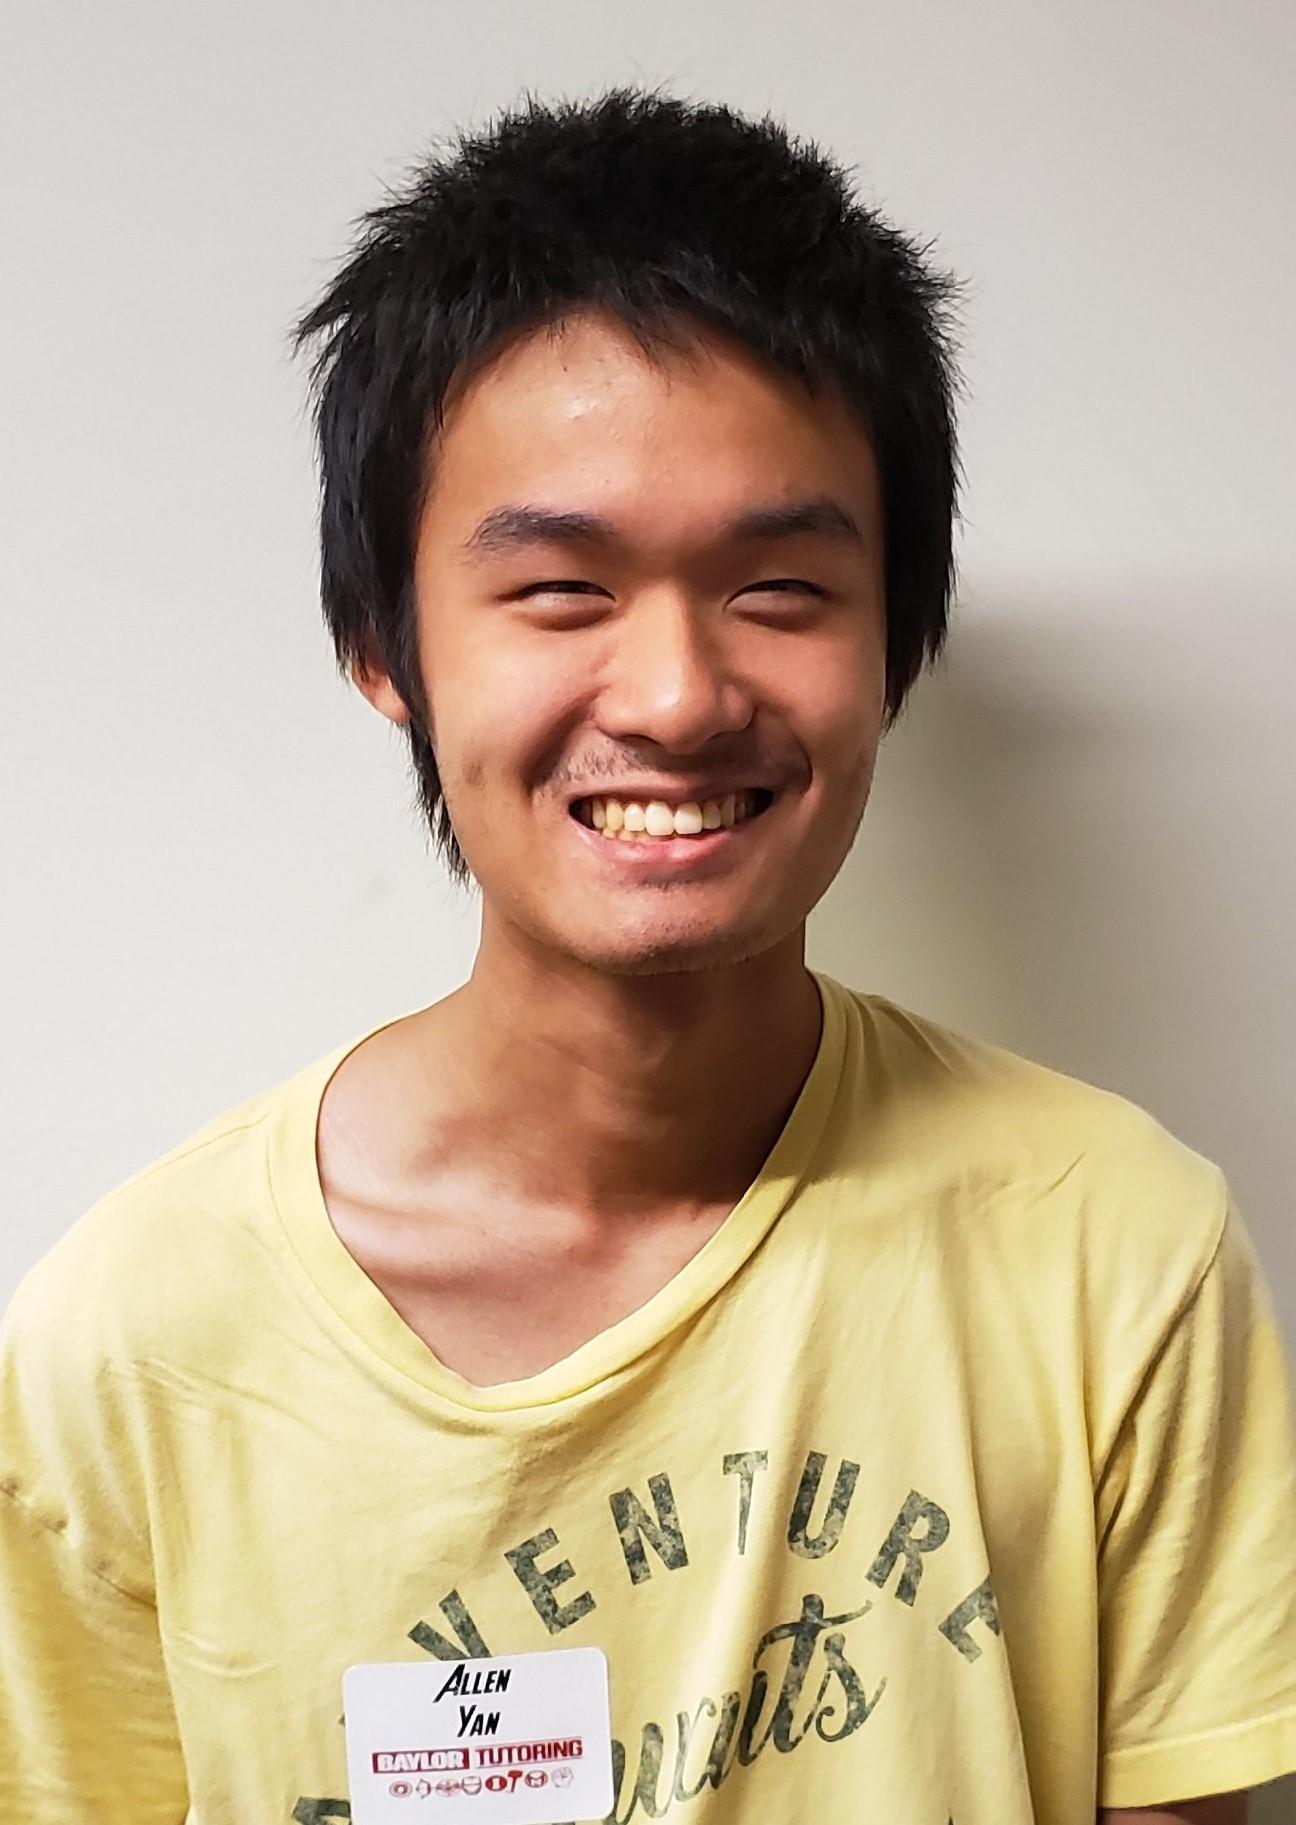 Allen Yan